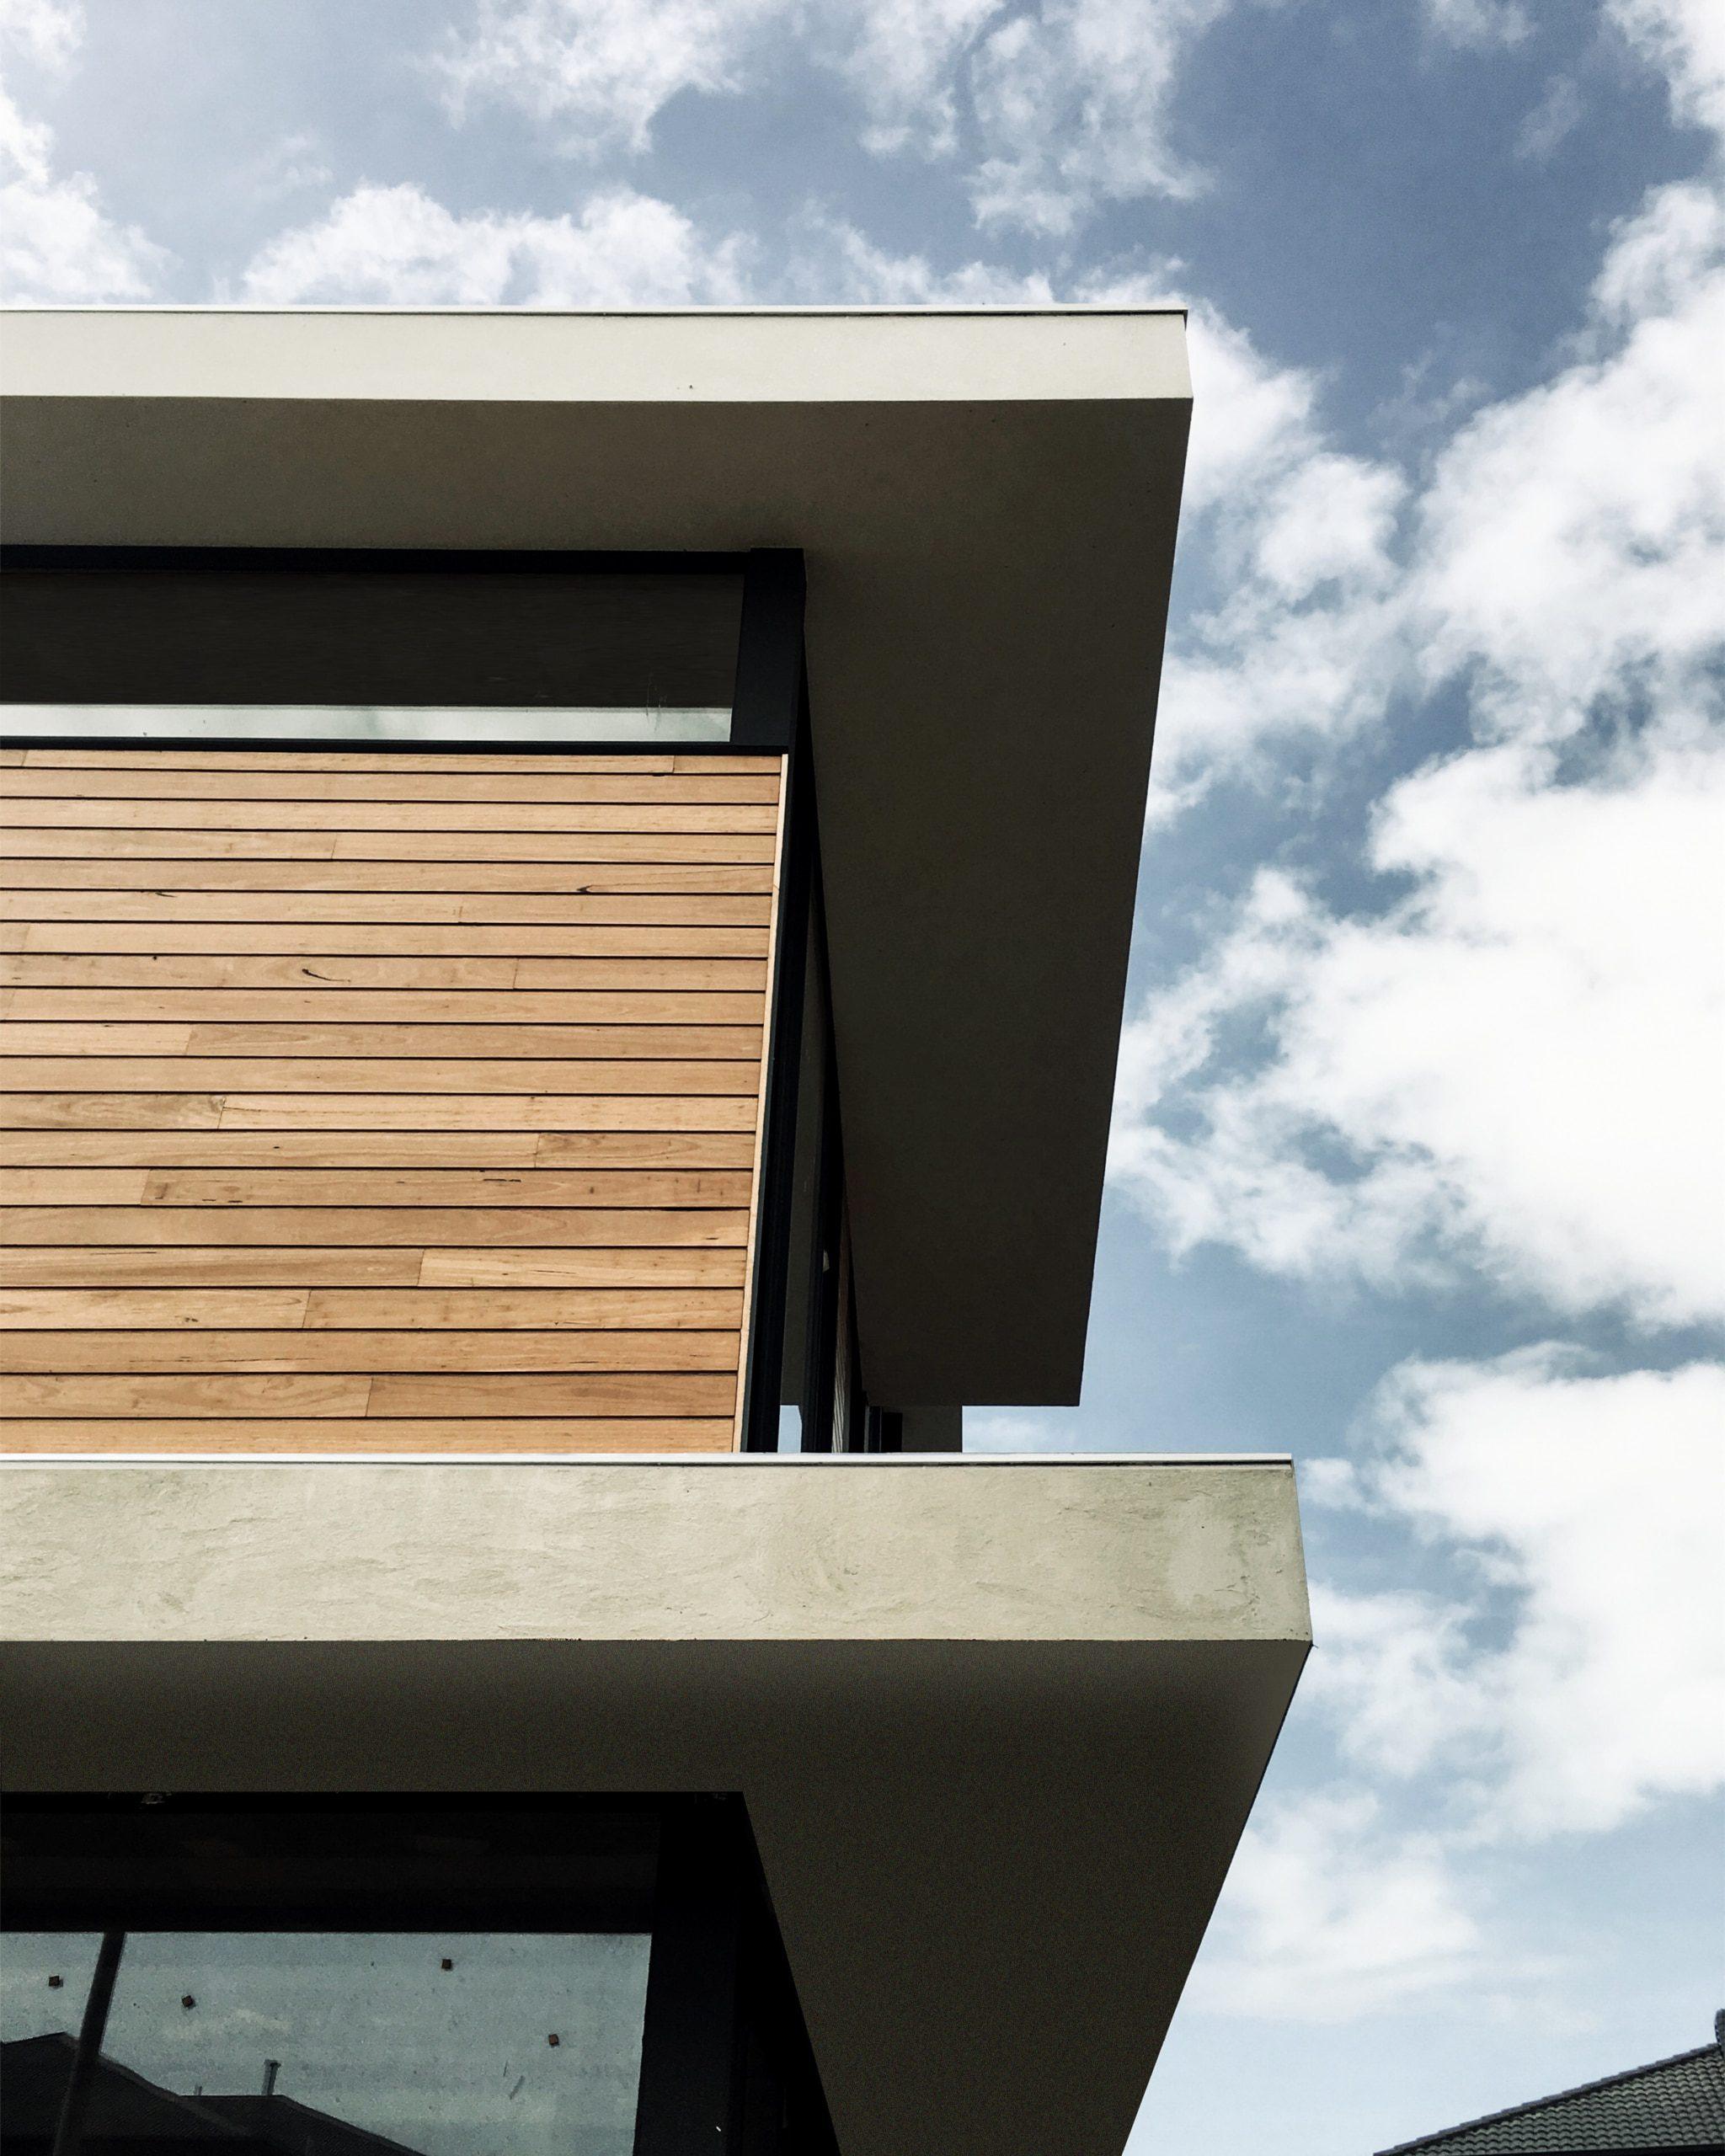 Wyndham Beach House - Modern Beach House Designed by Sky Architect Studio